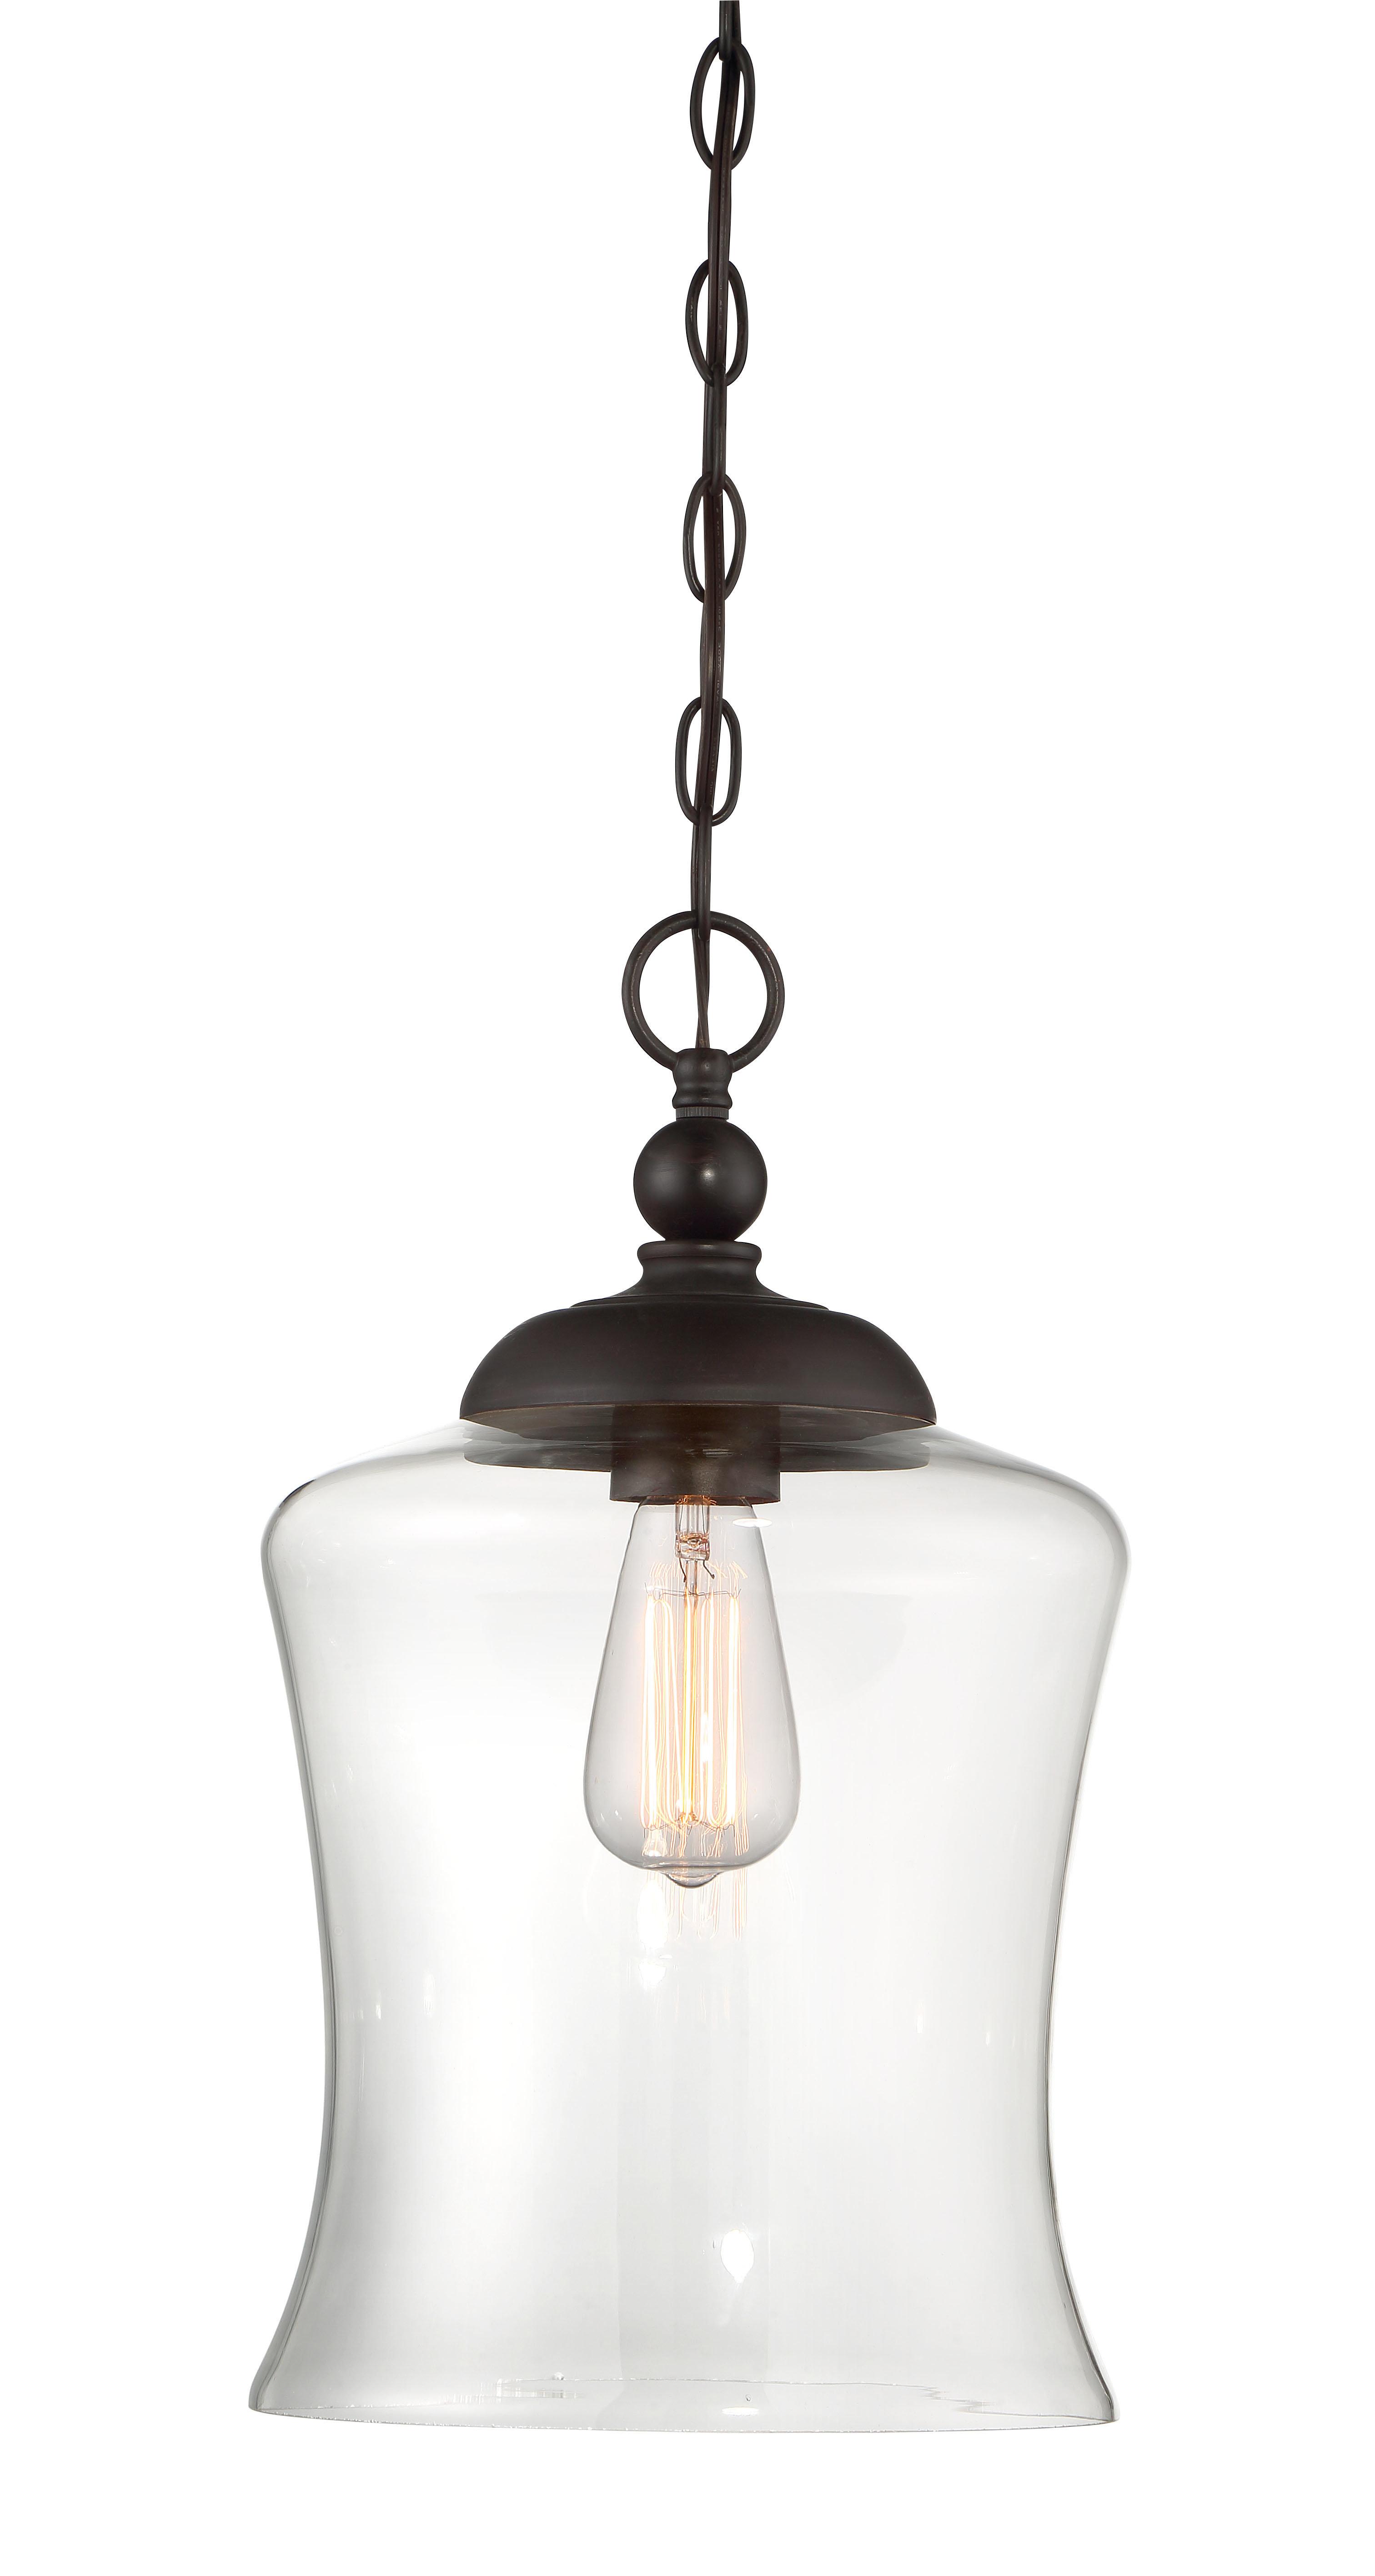 Van Horne 3-Light Single Teardrop Pendants pertaining to Most Current Wentzville 1-Light Single Bell Pendant